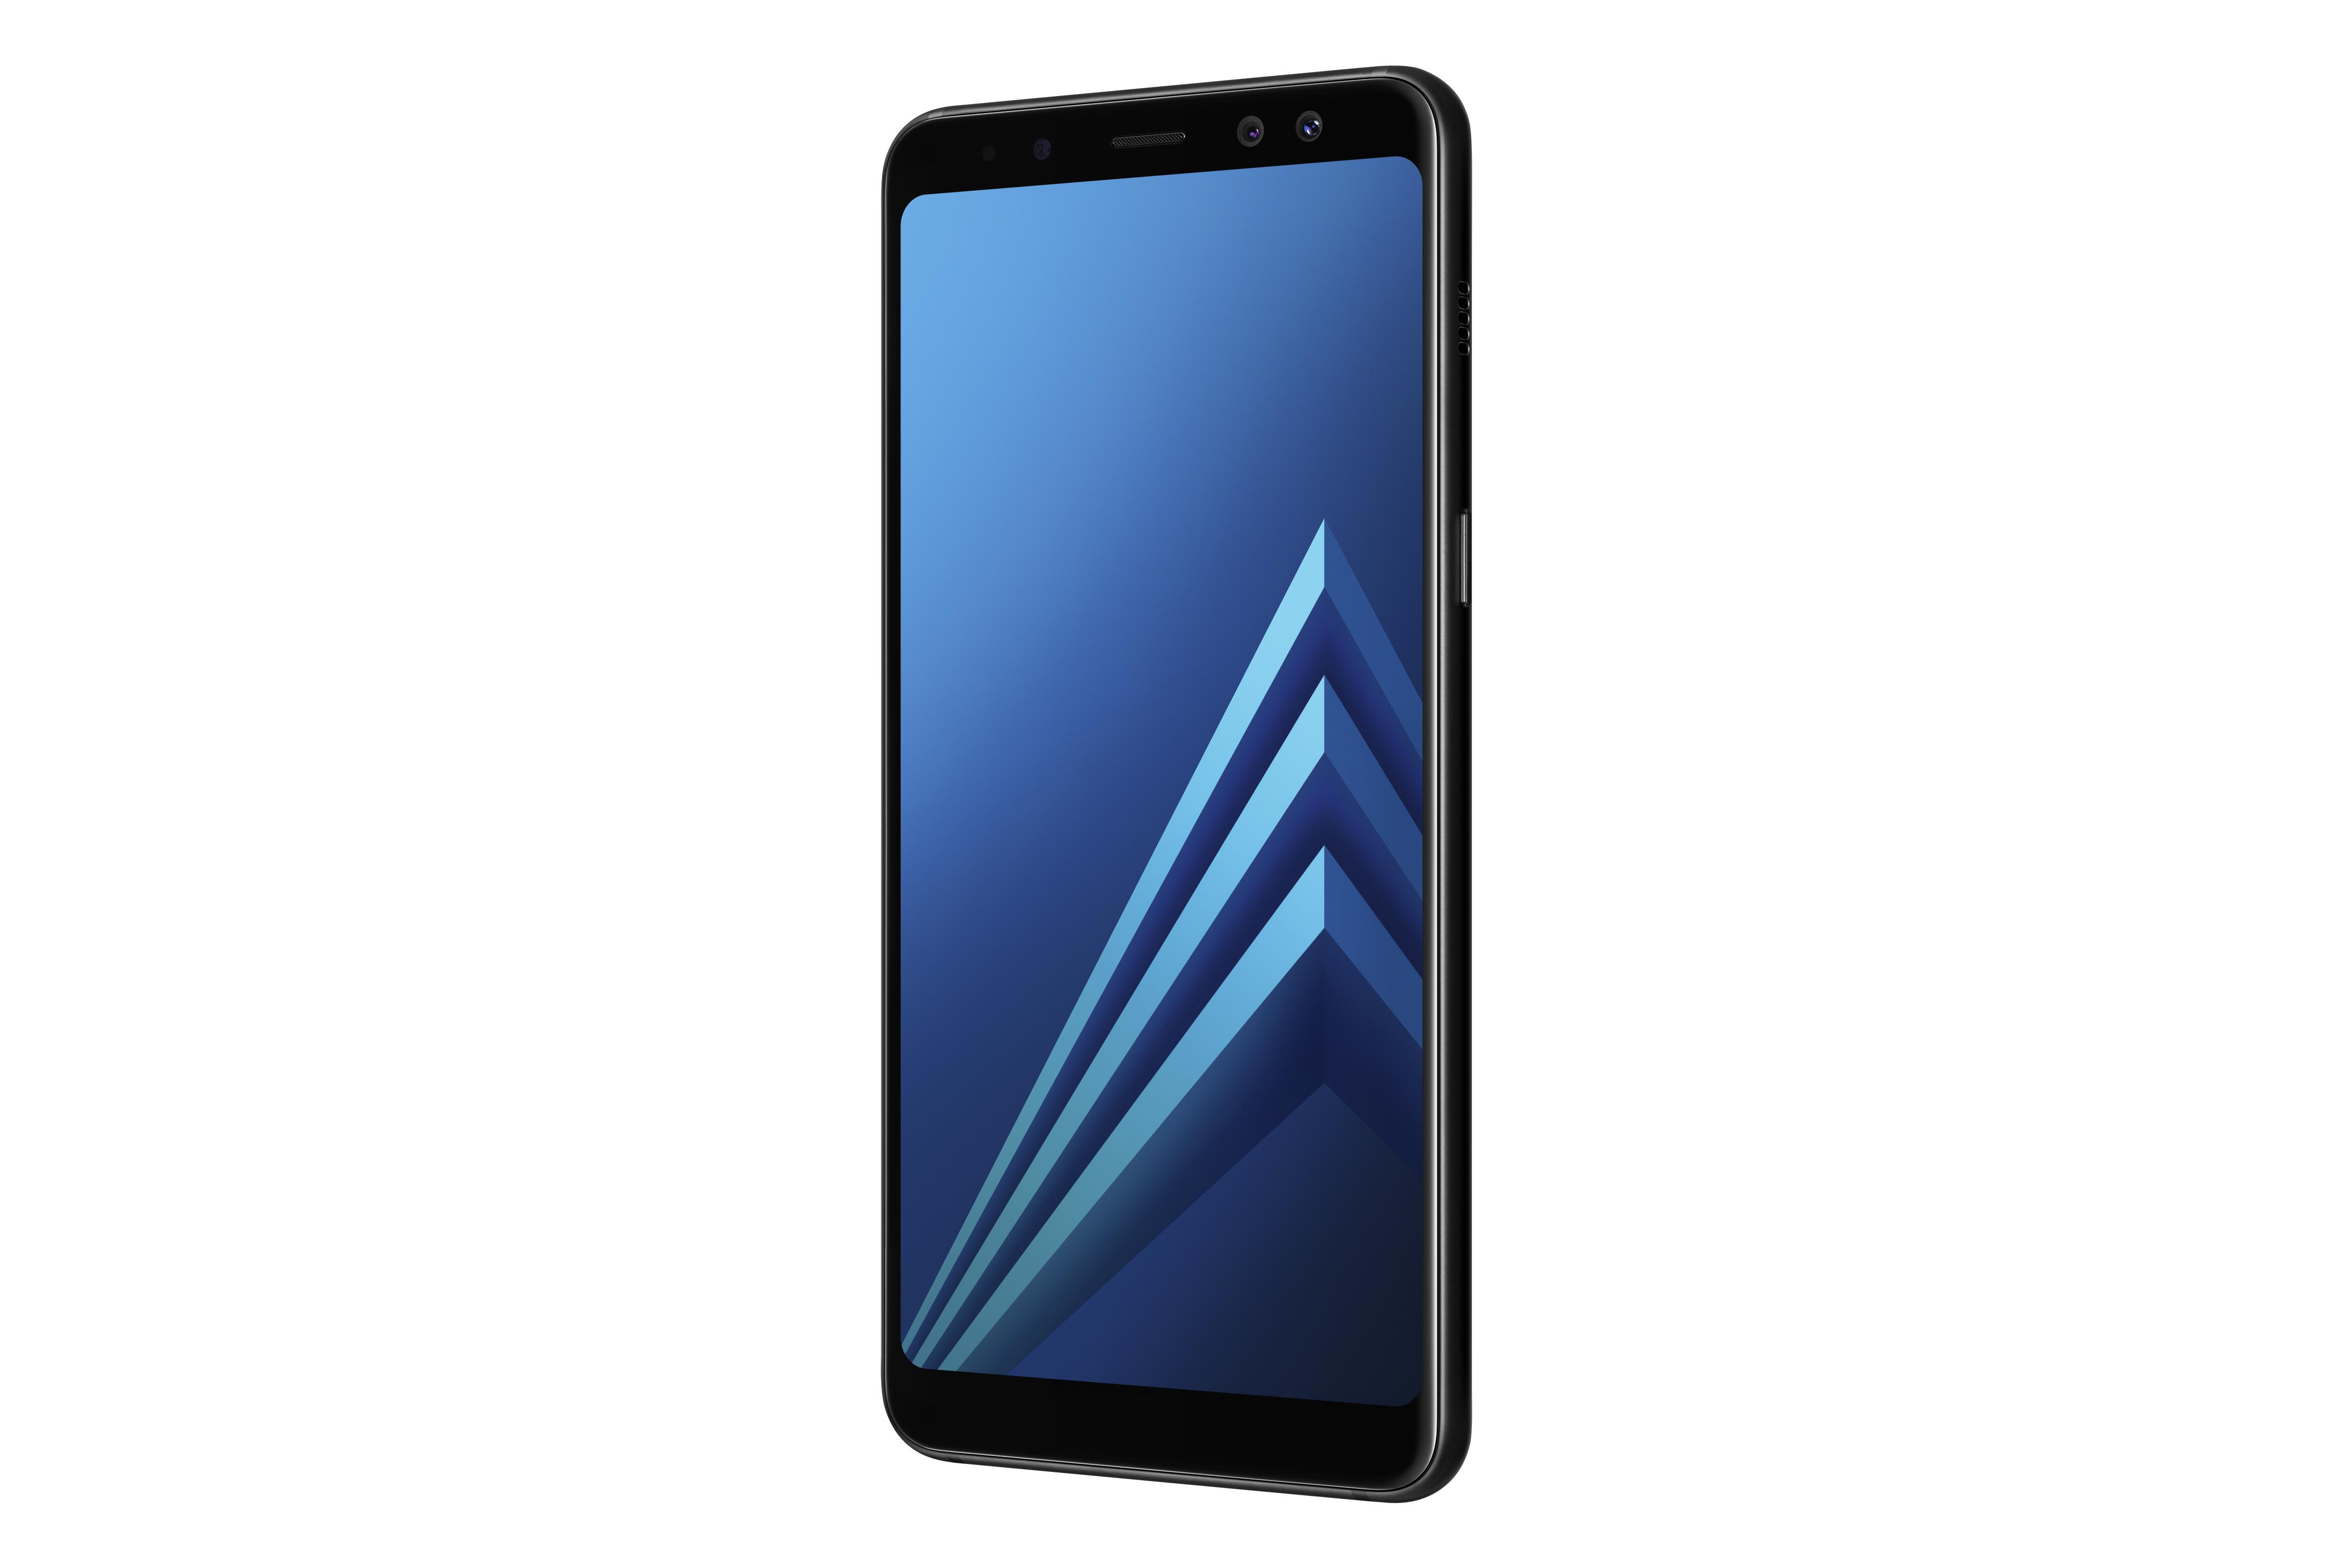 Noul Samsung Galaxy A8 disponibil incepand din aceasta saptamana